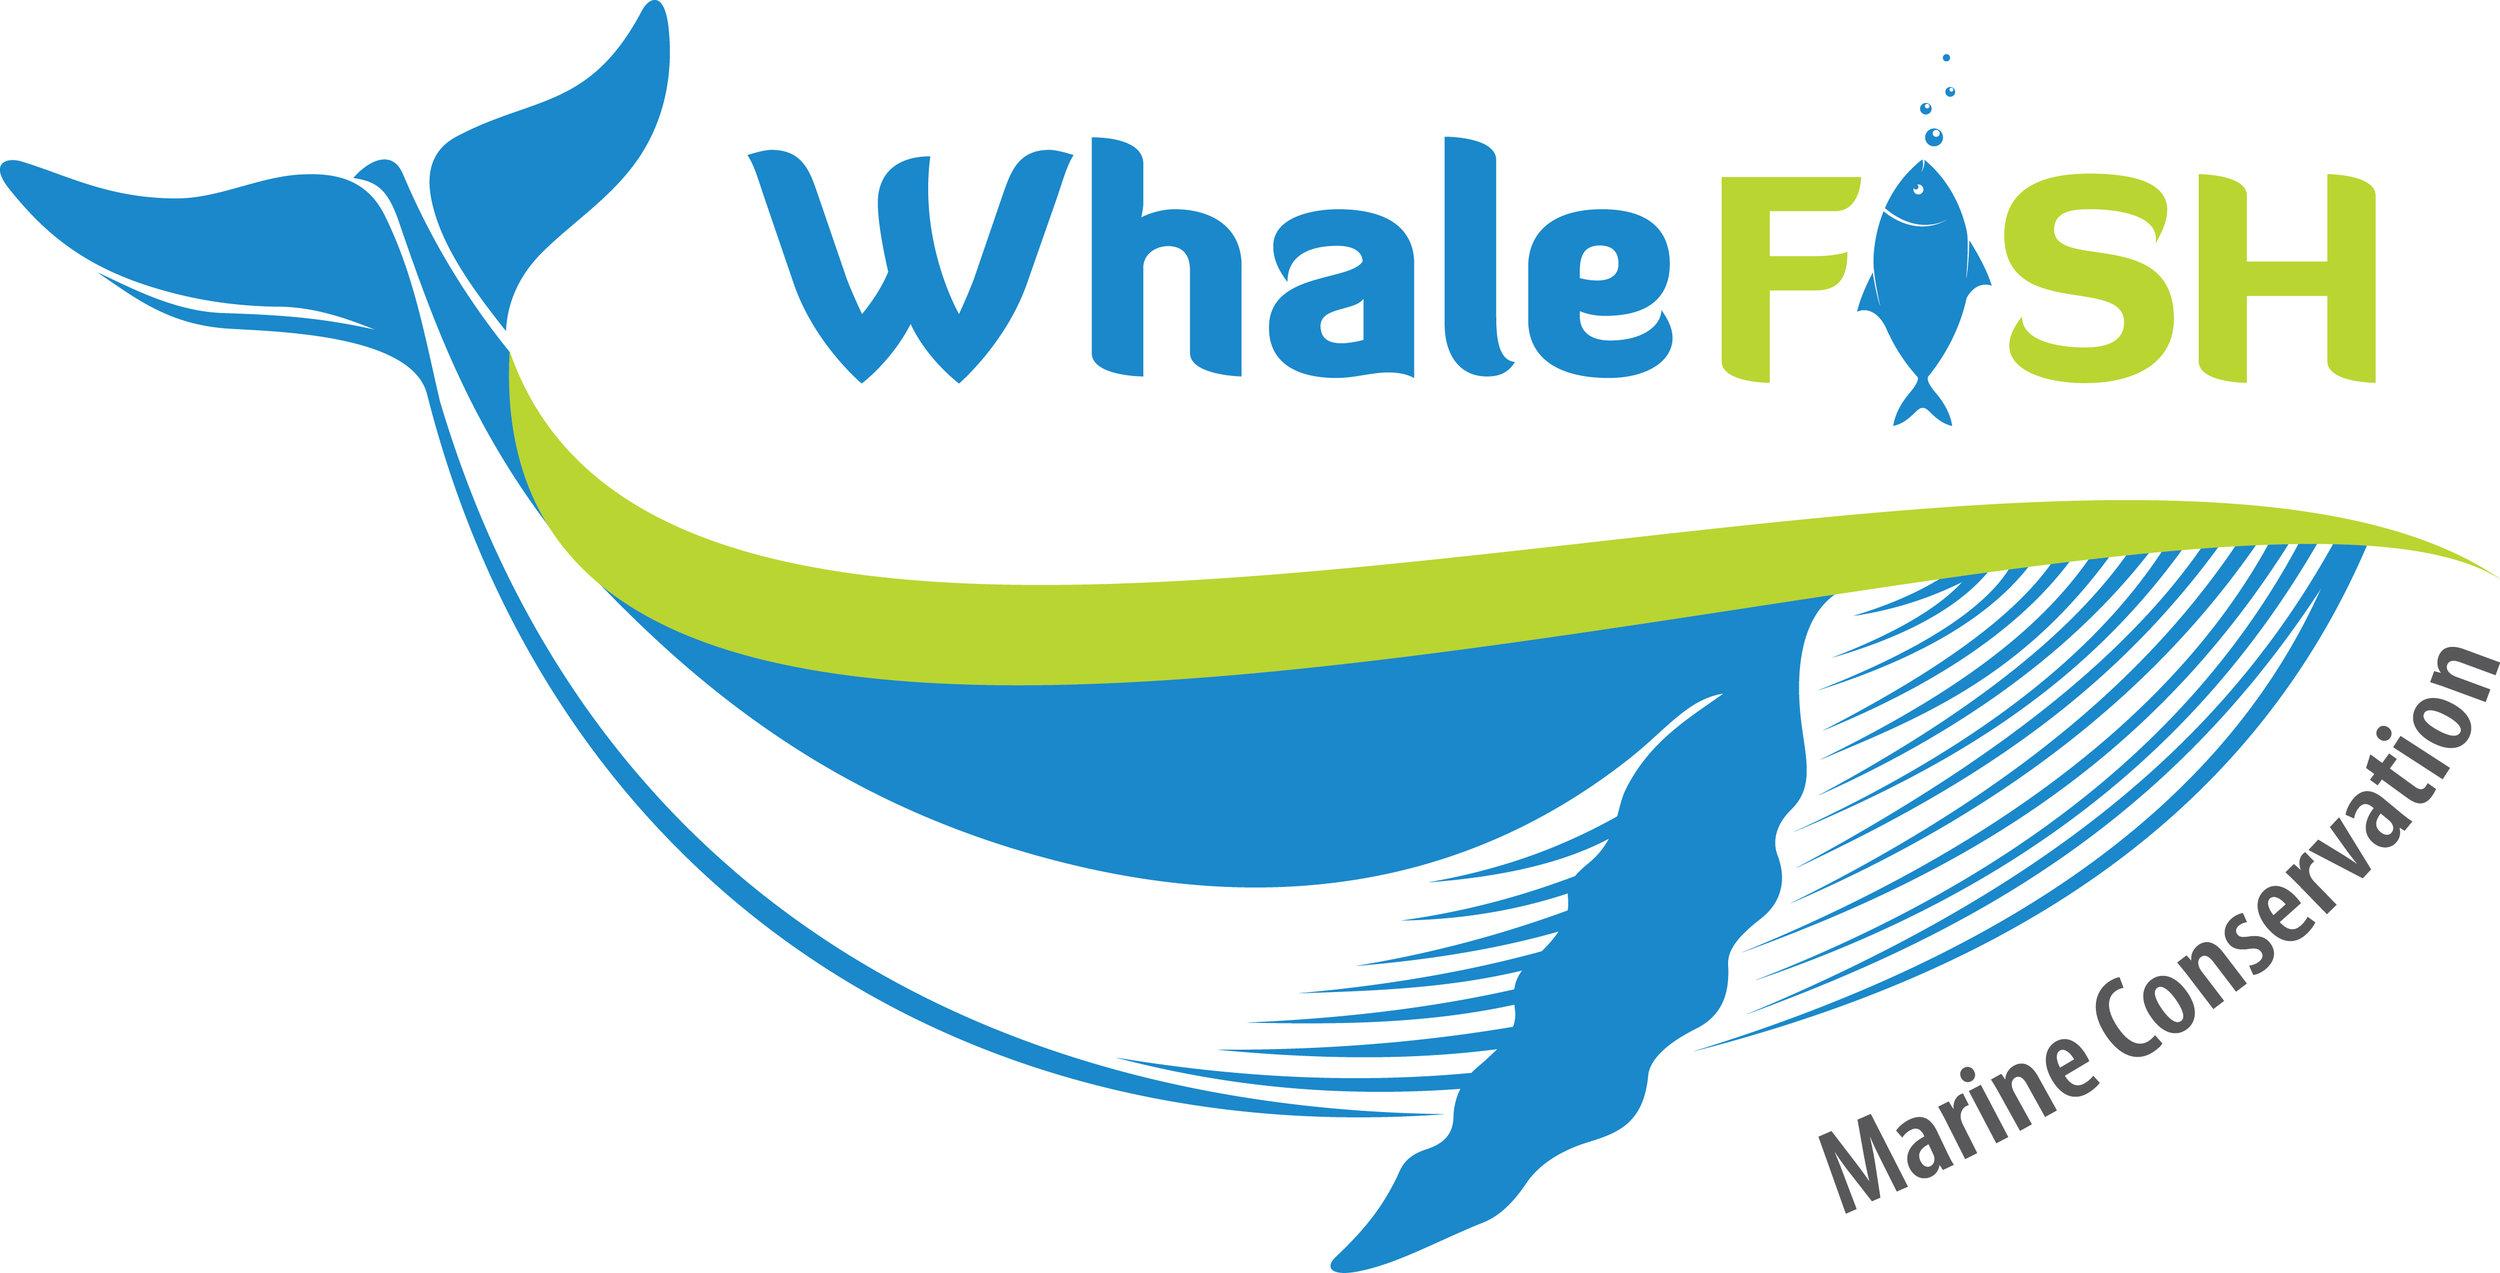 WF_Logo_With_Strap.jpg